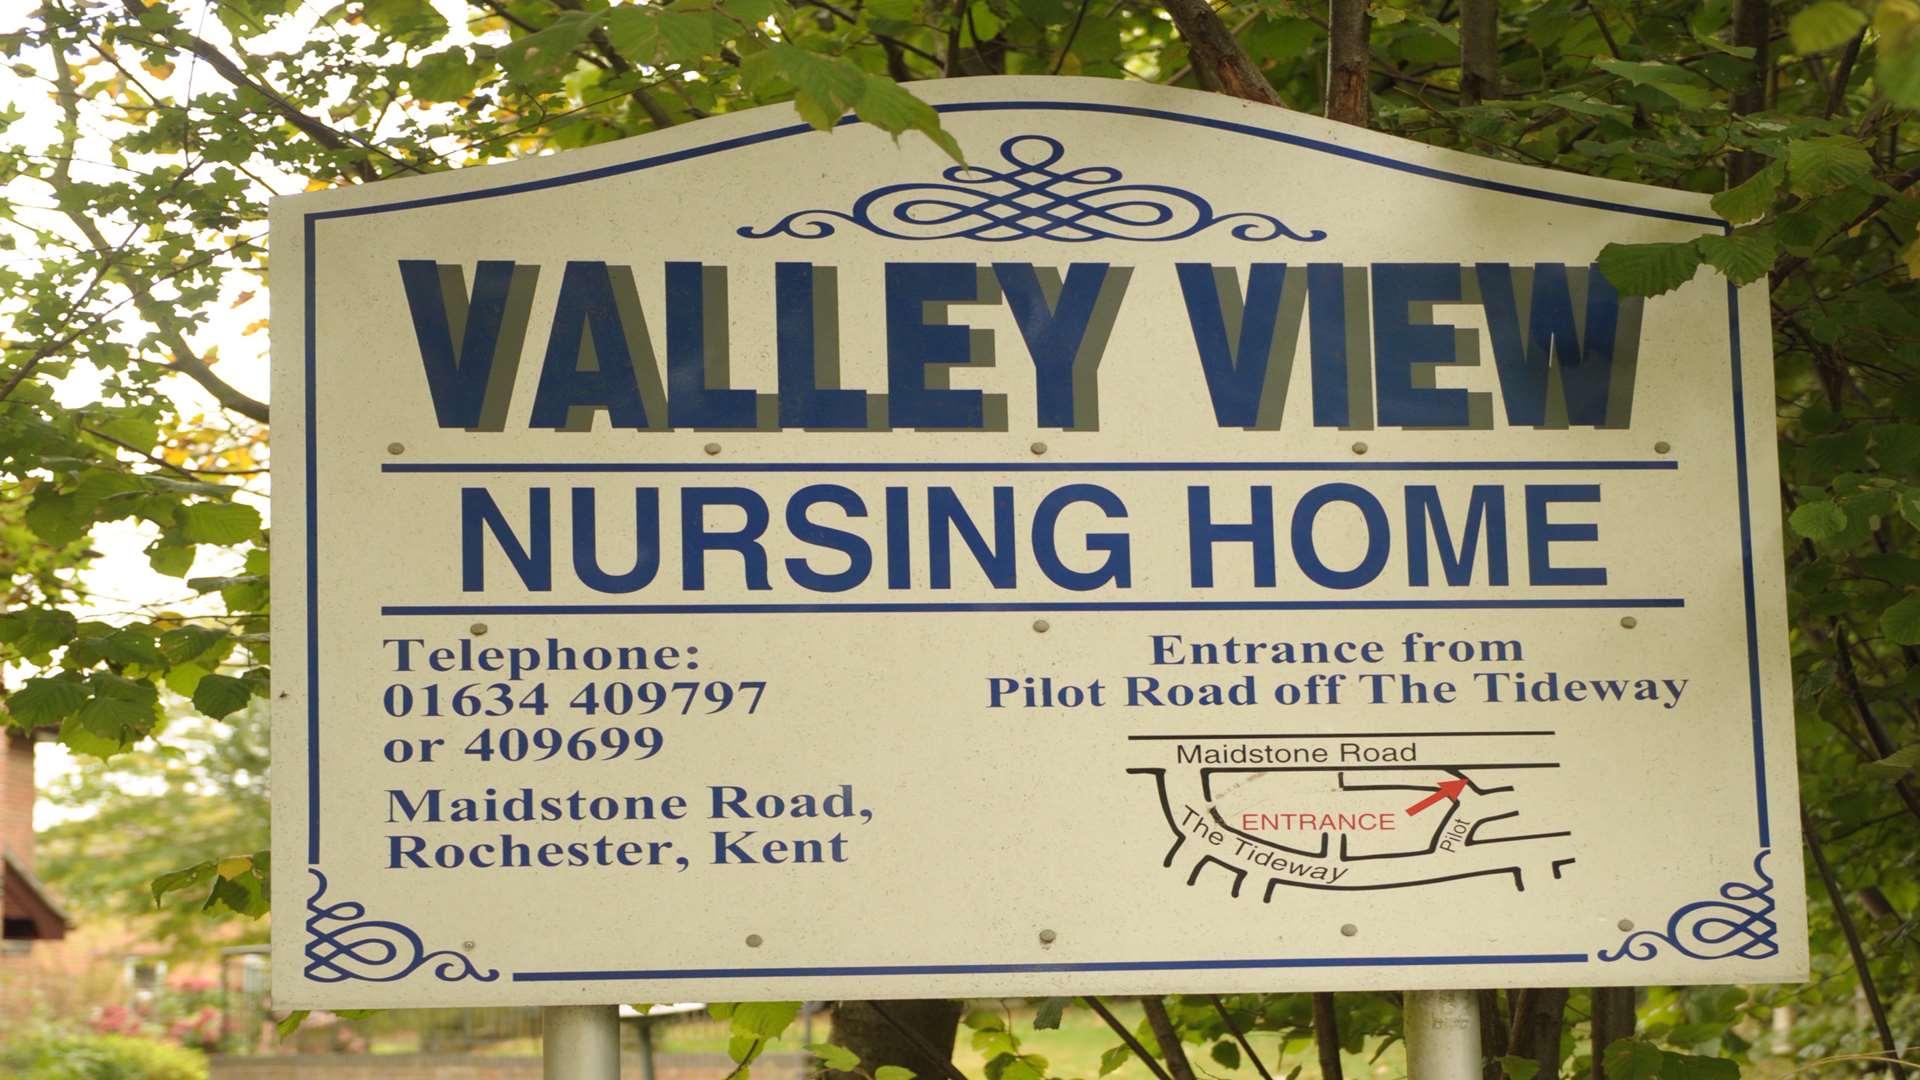 Valley View Nursing Home